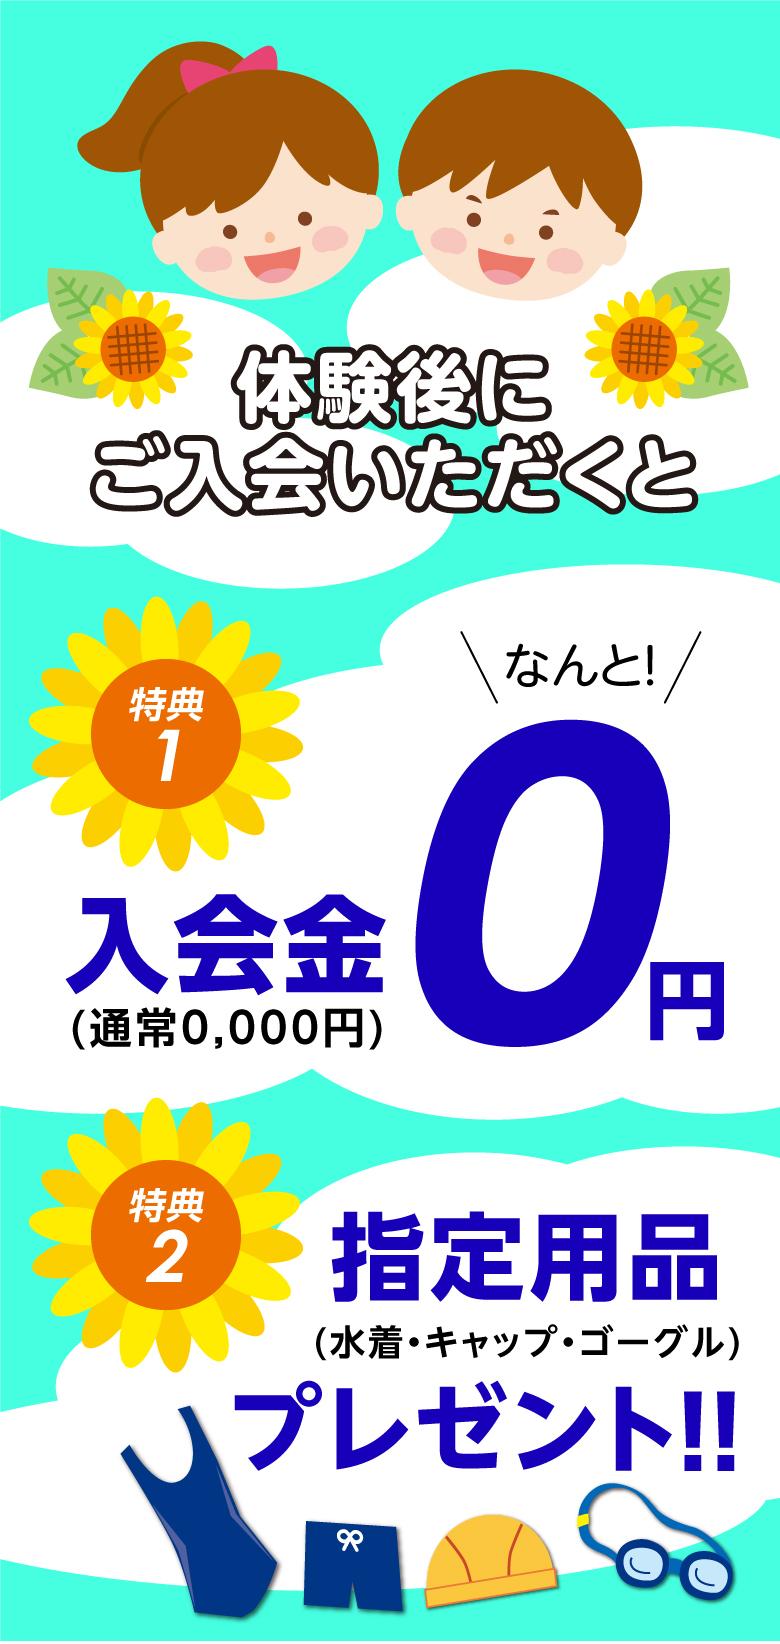 cd-cv-ch-21n-lp-base-01